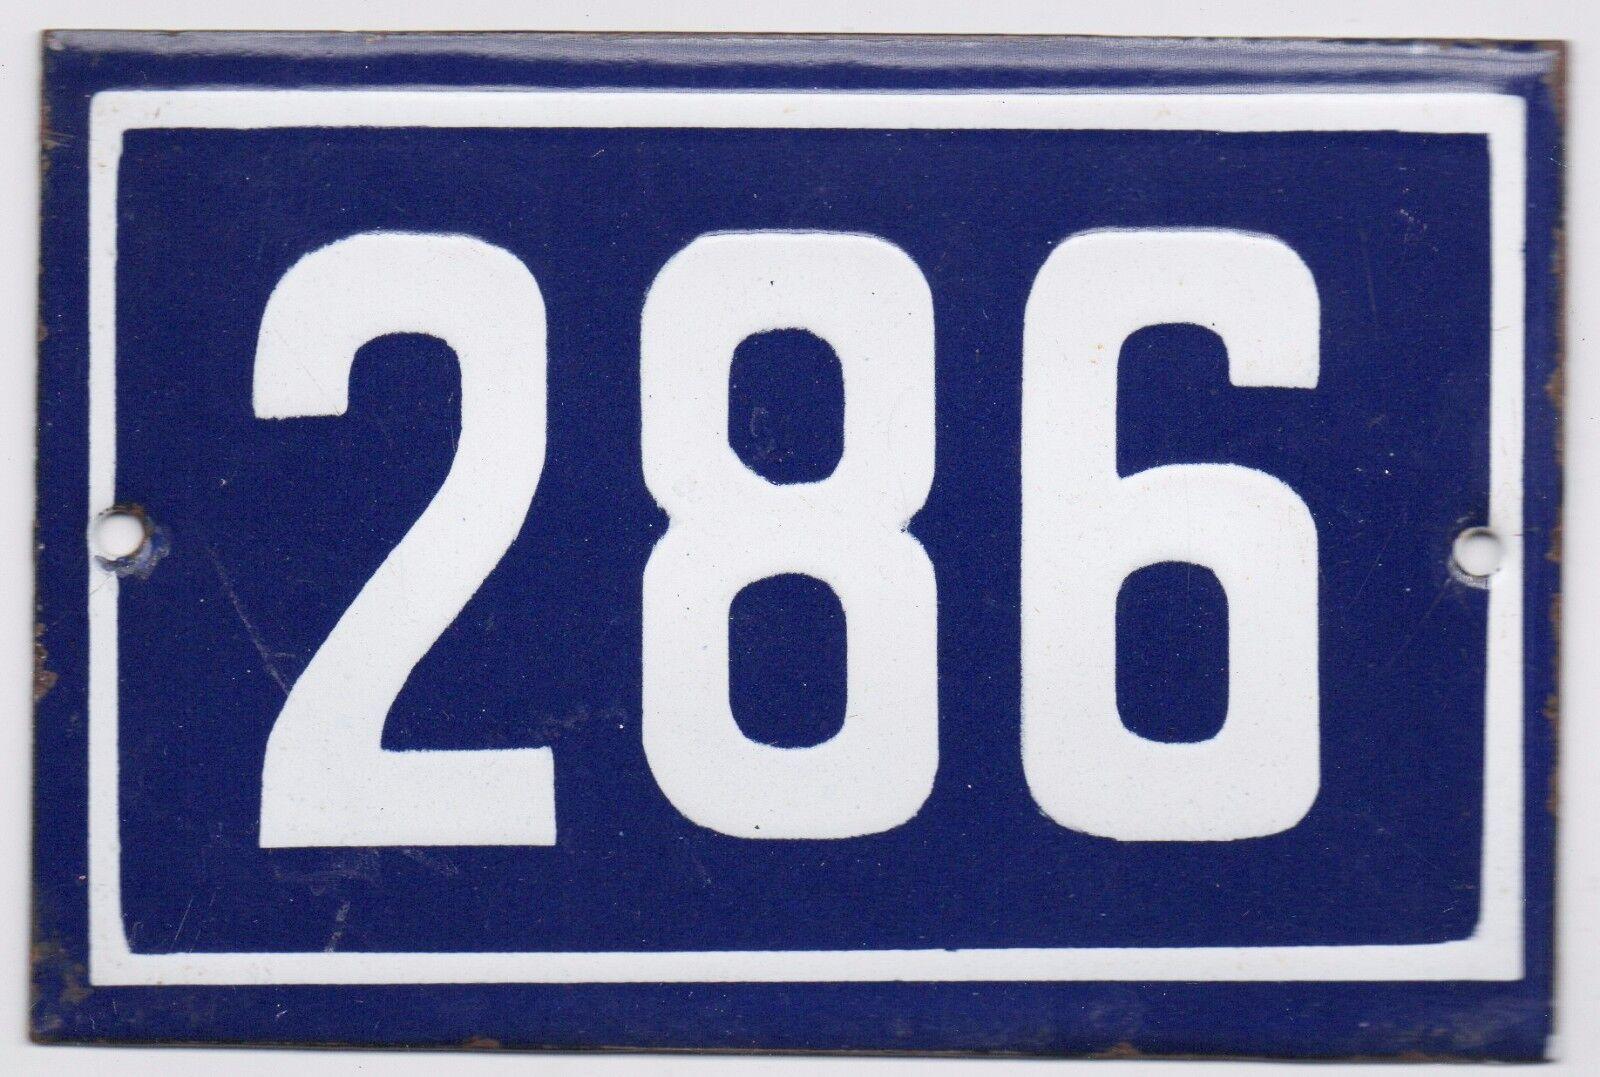 Old Blau French house number 286 door gate plate plaque enamel steel metal sign